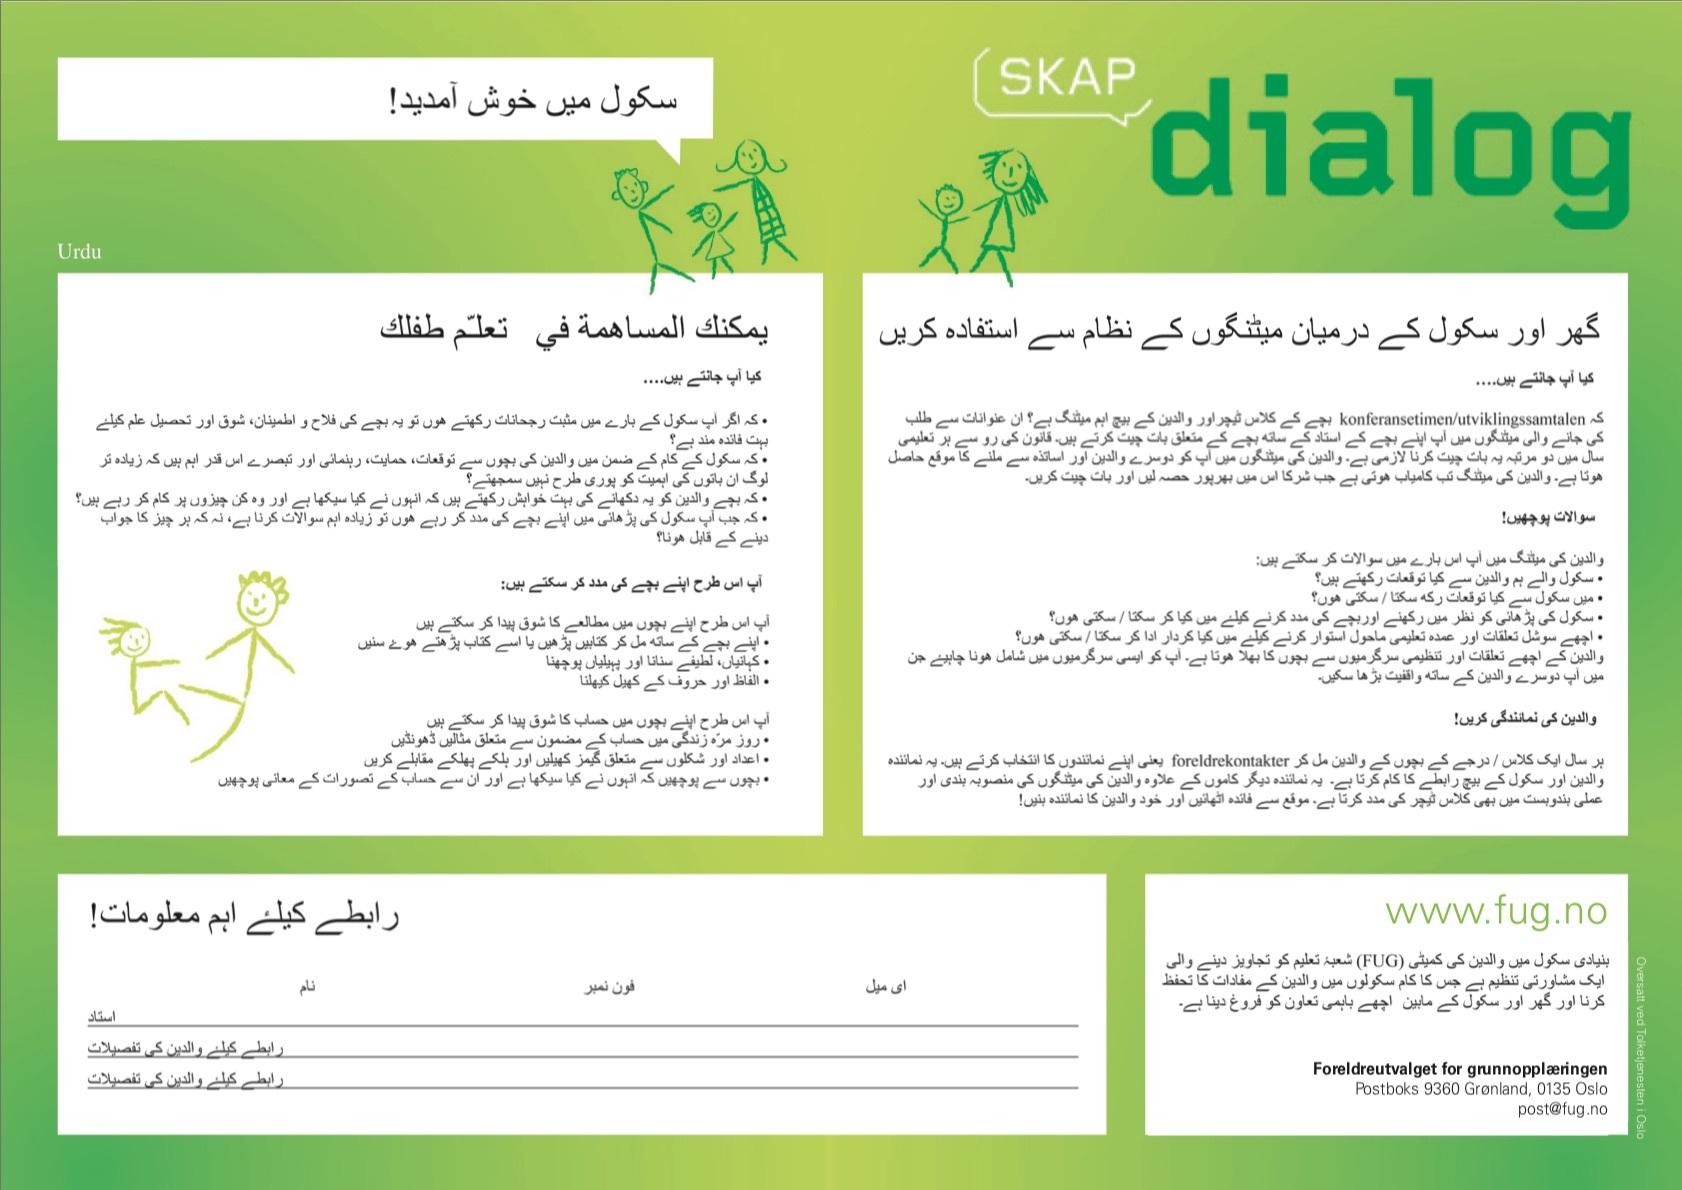 Skap dialog 1 urdu